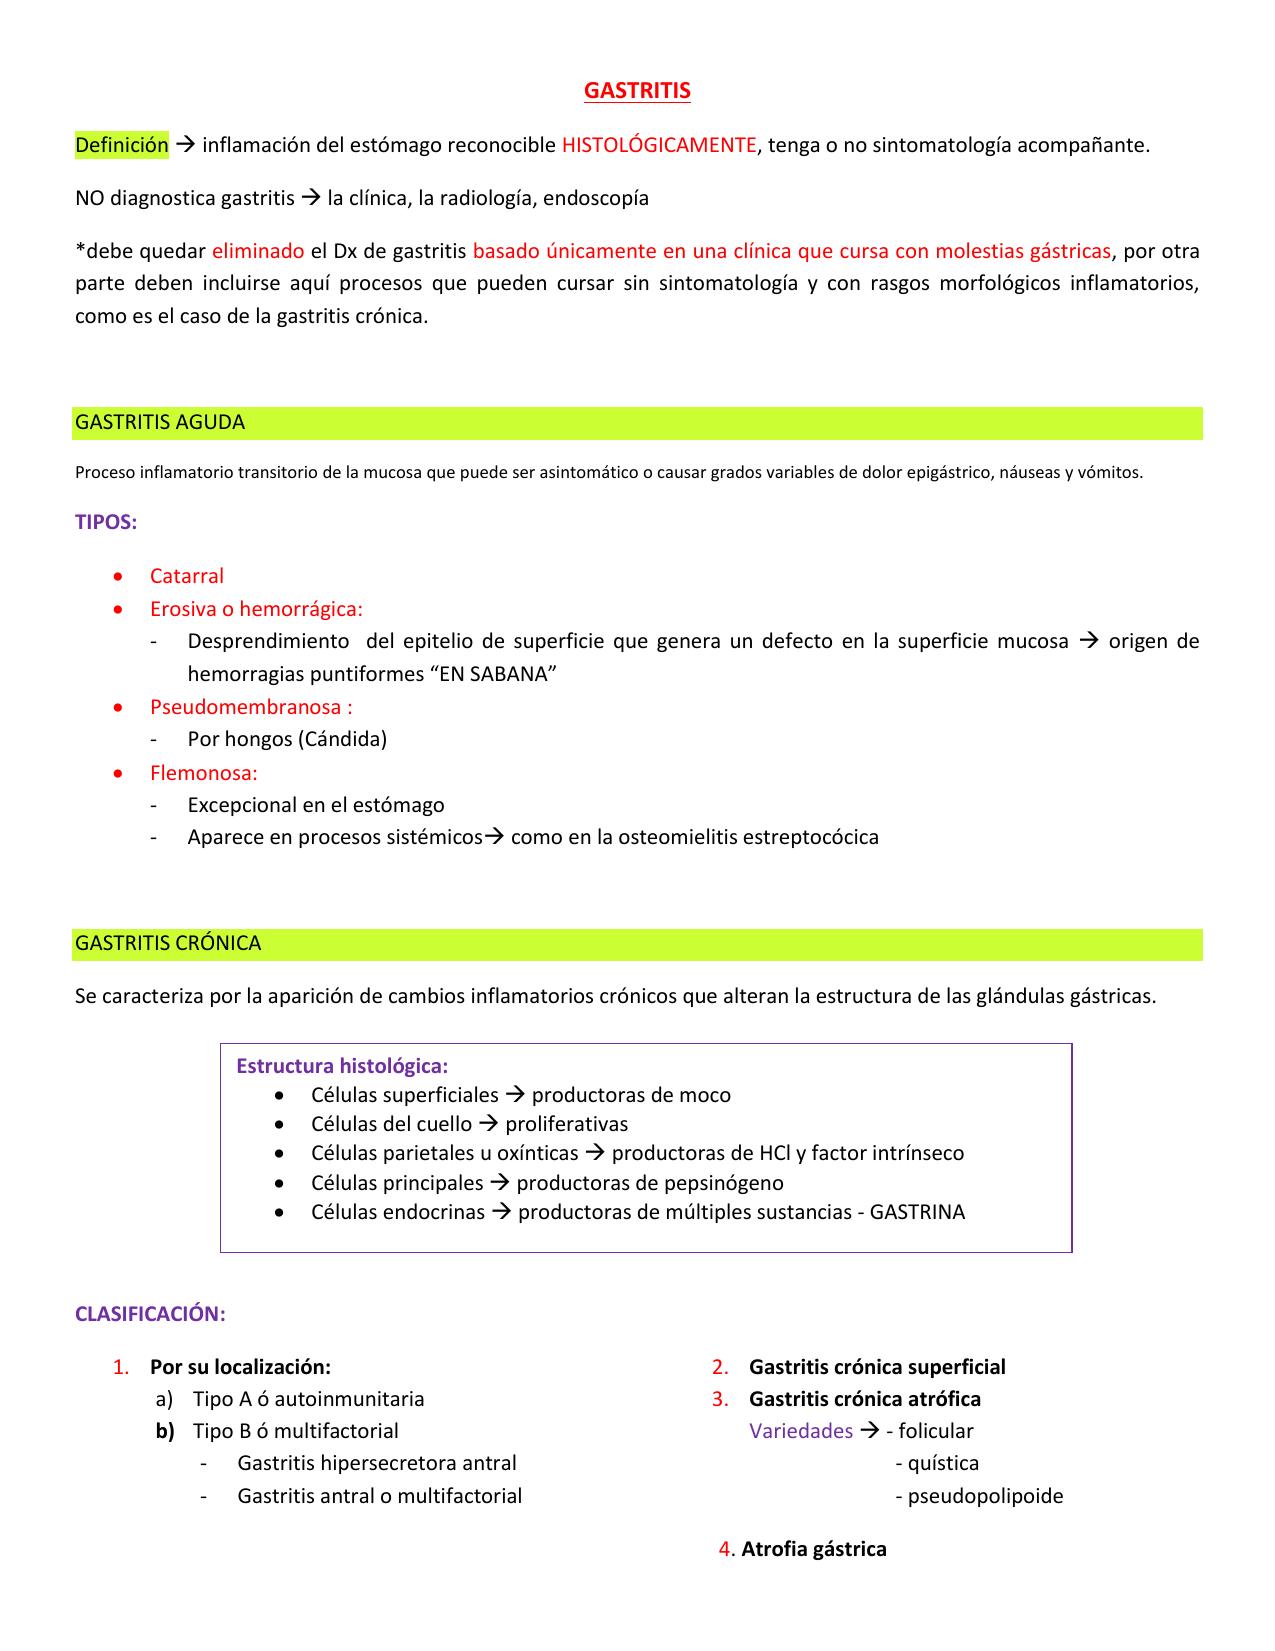 Gastritis cronica antral atrofica